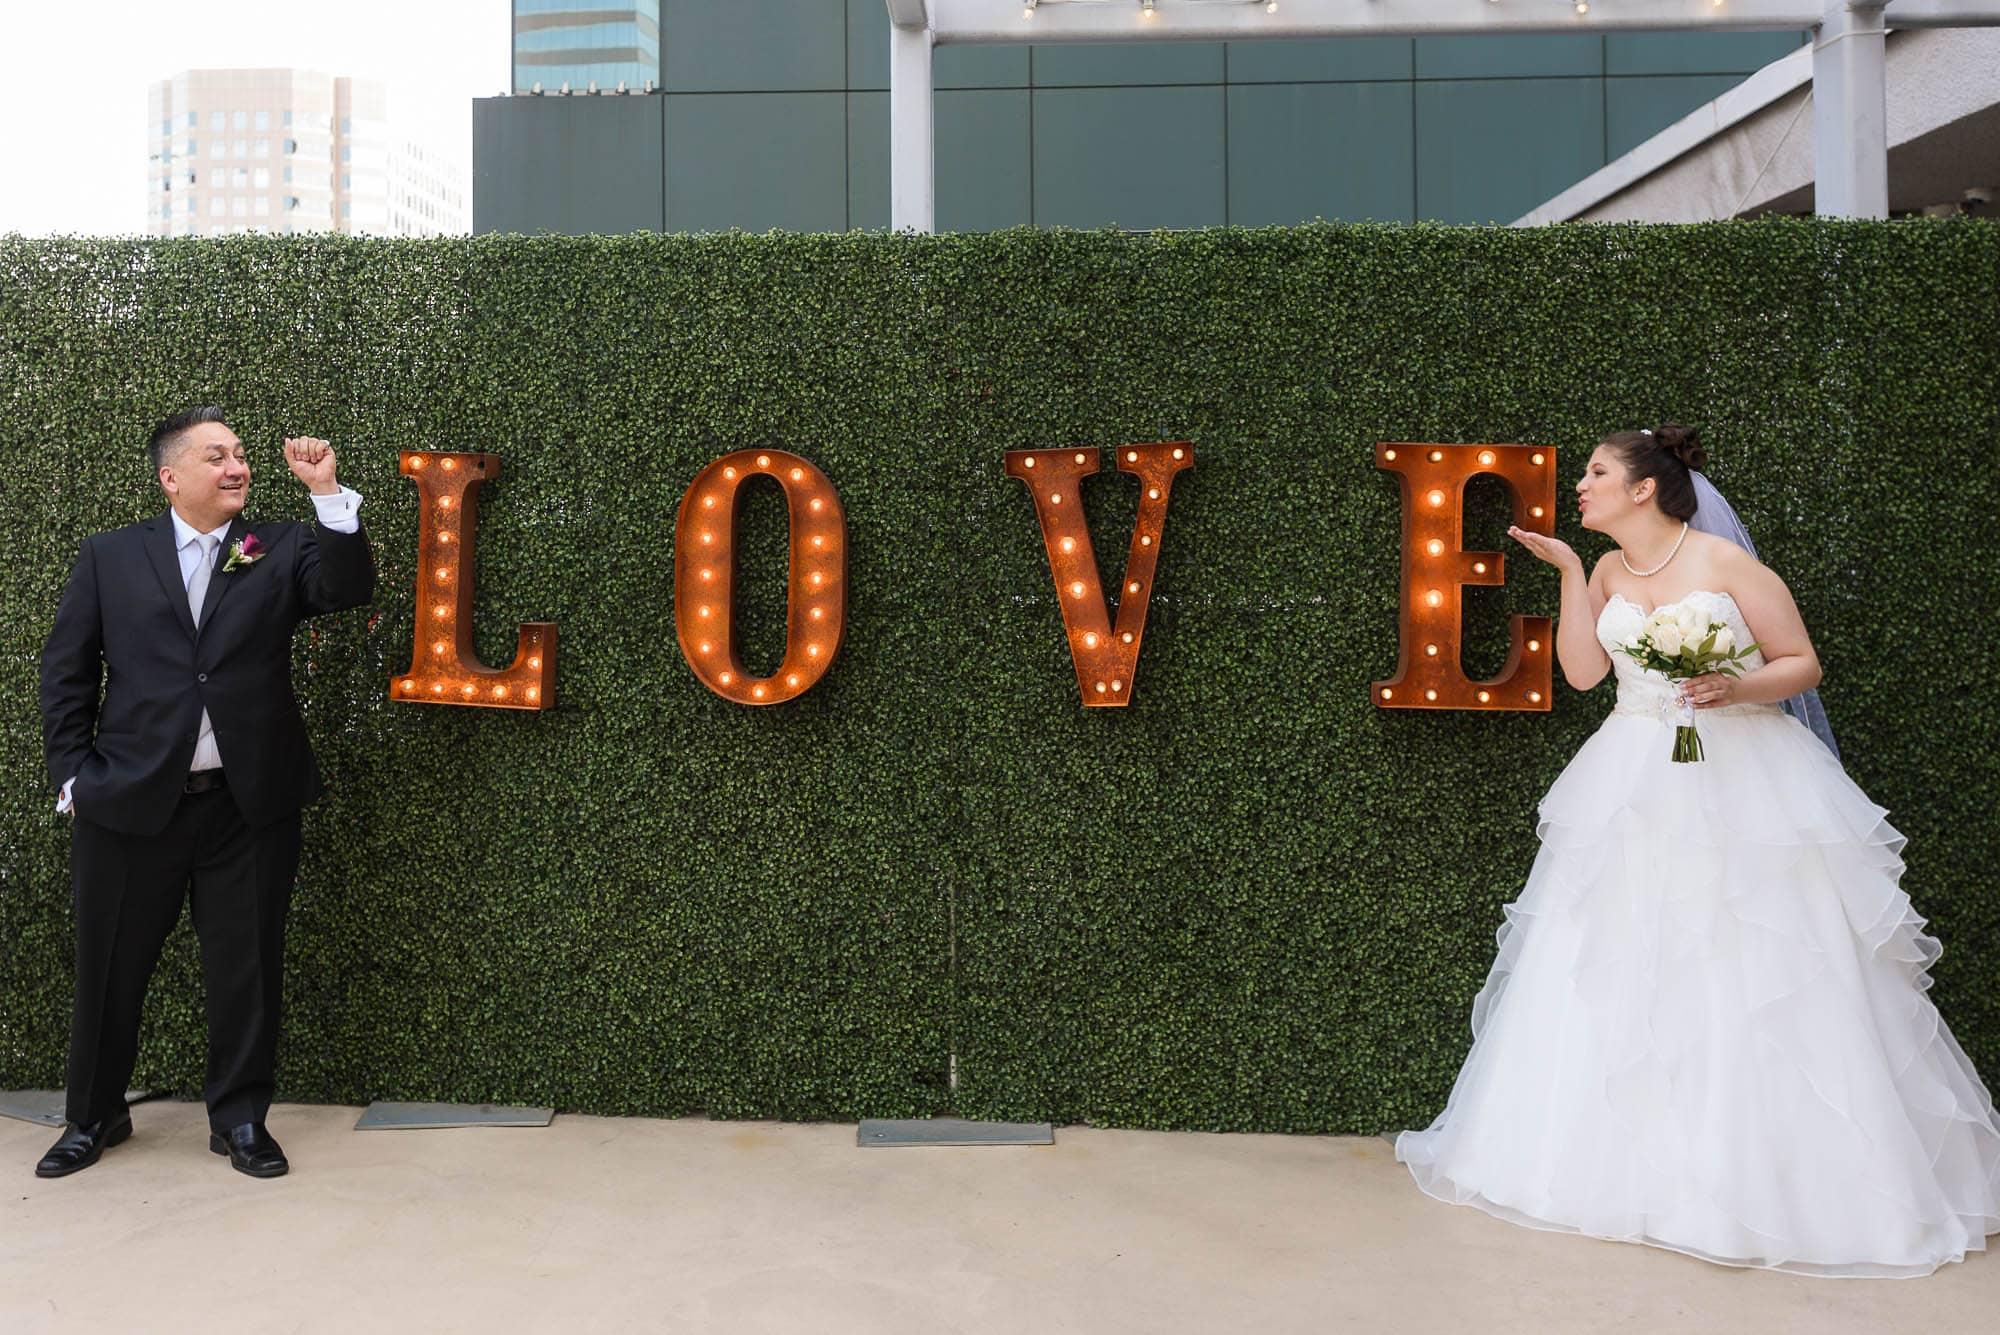 012_Alan_and_Heidi_Wedding_Nicole_Roman